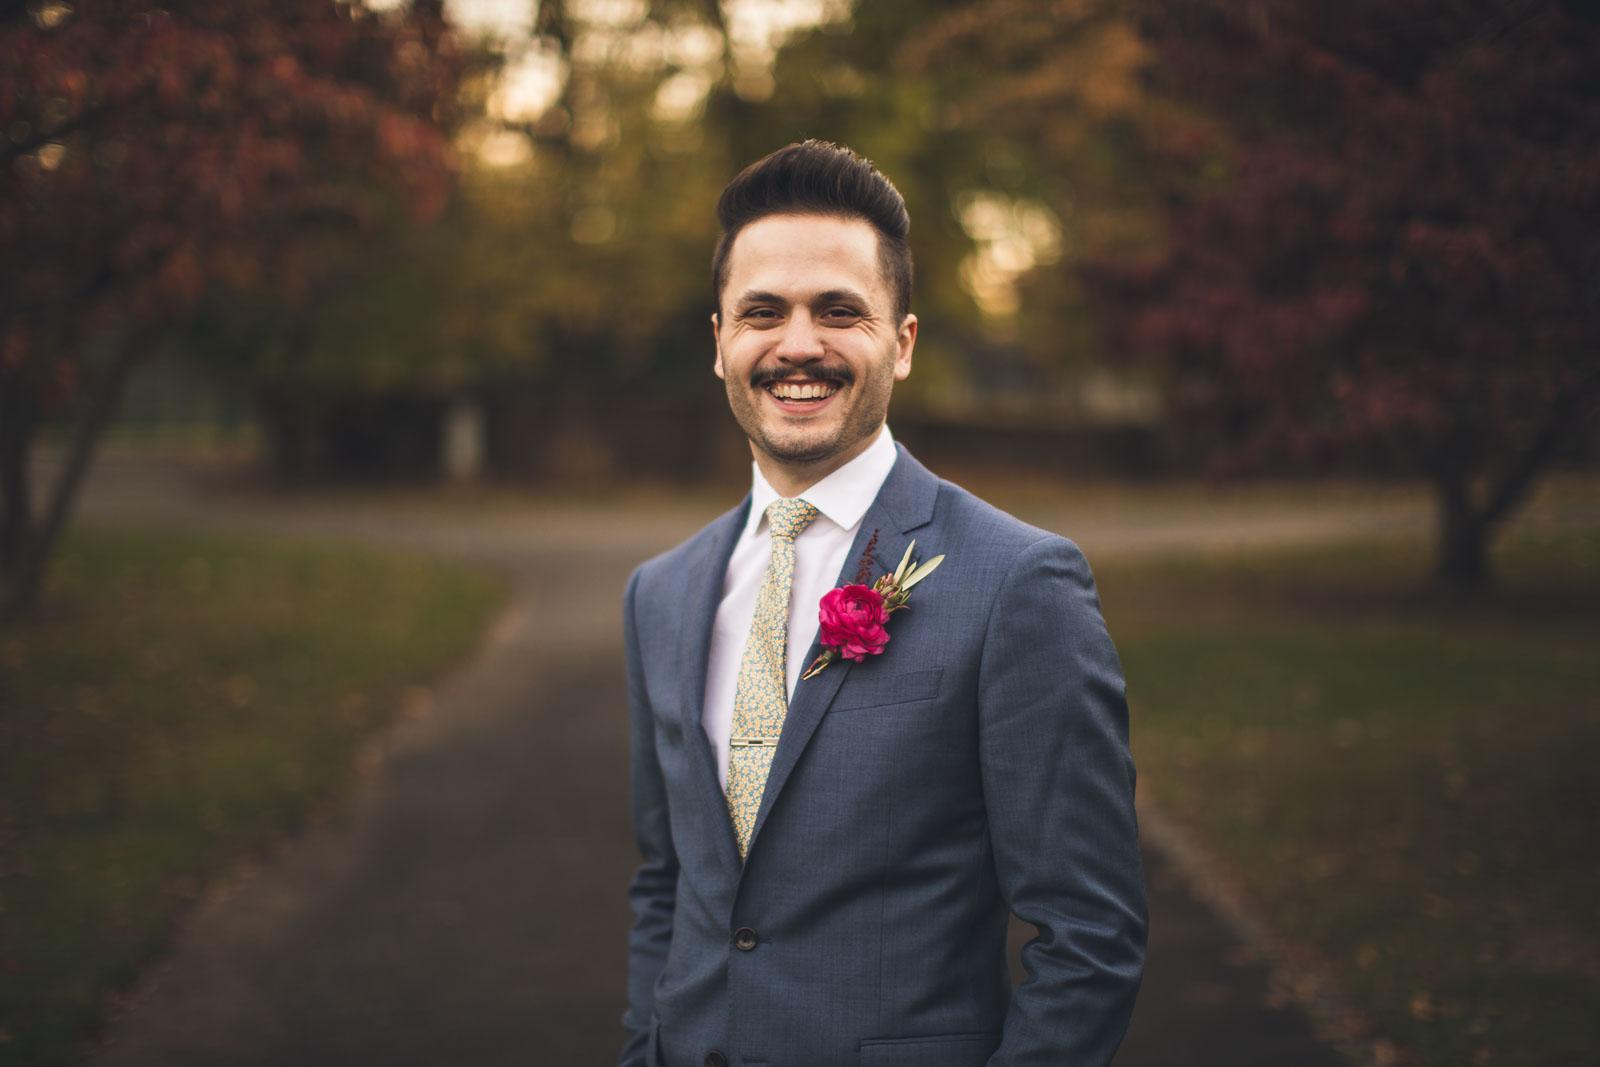 Groom Wedding Portrait New Jersey